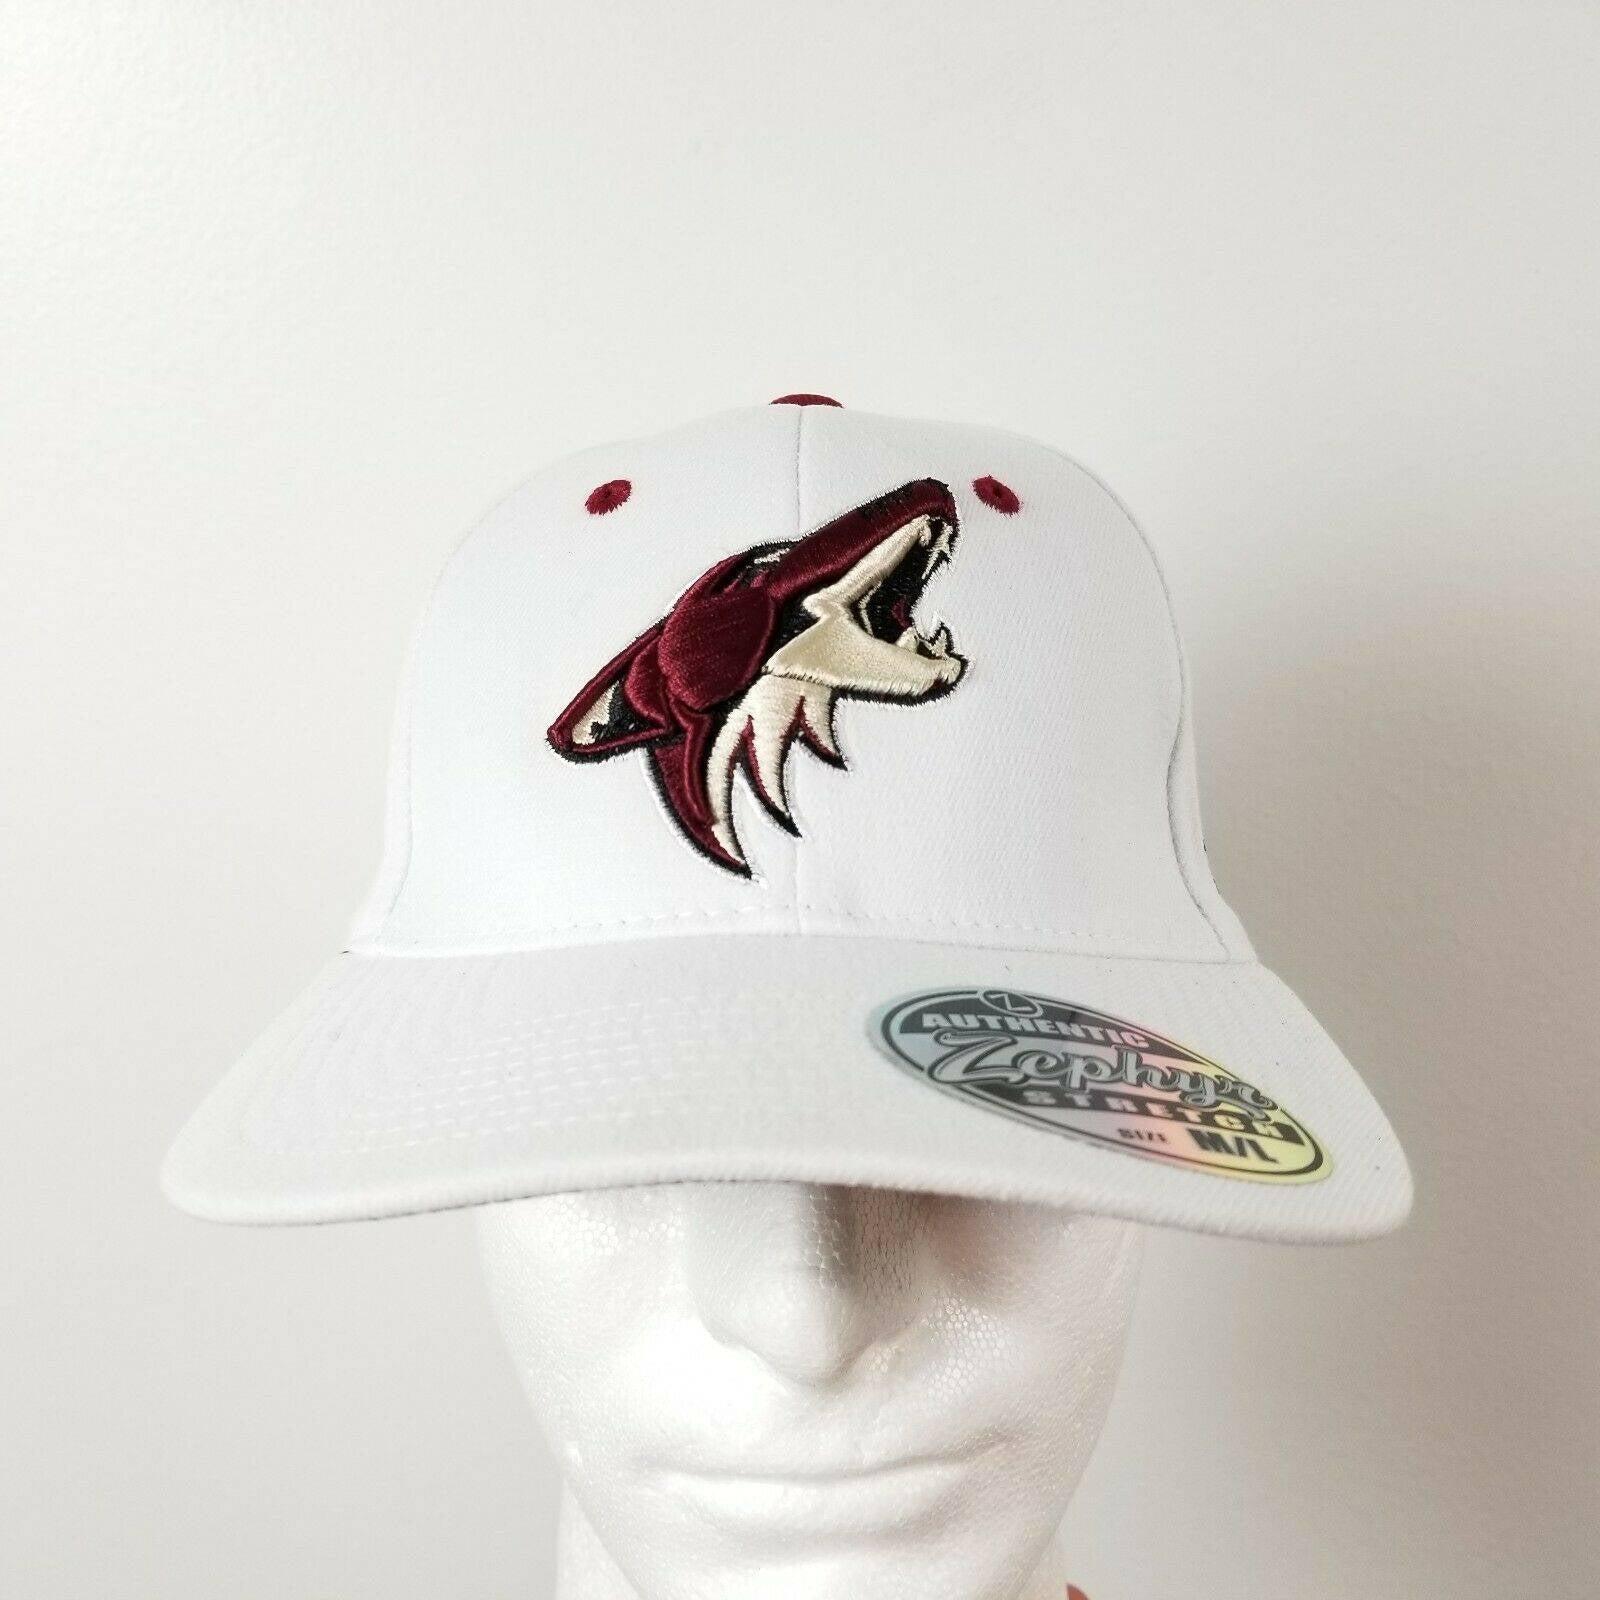 Zephyr Arizona Coyotes Hat M/L Stretch